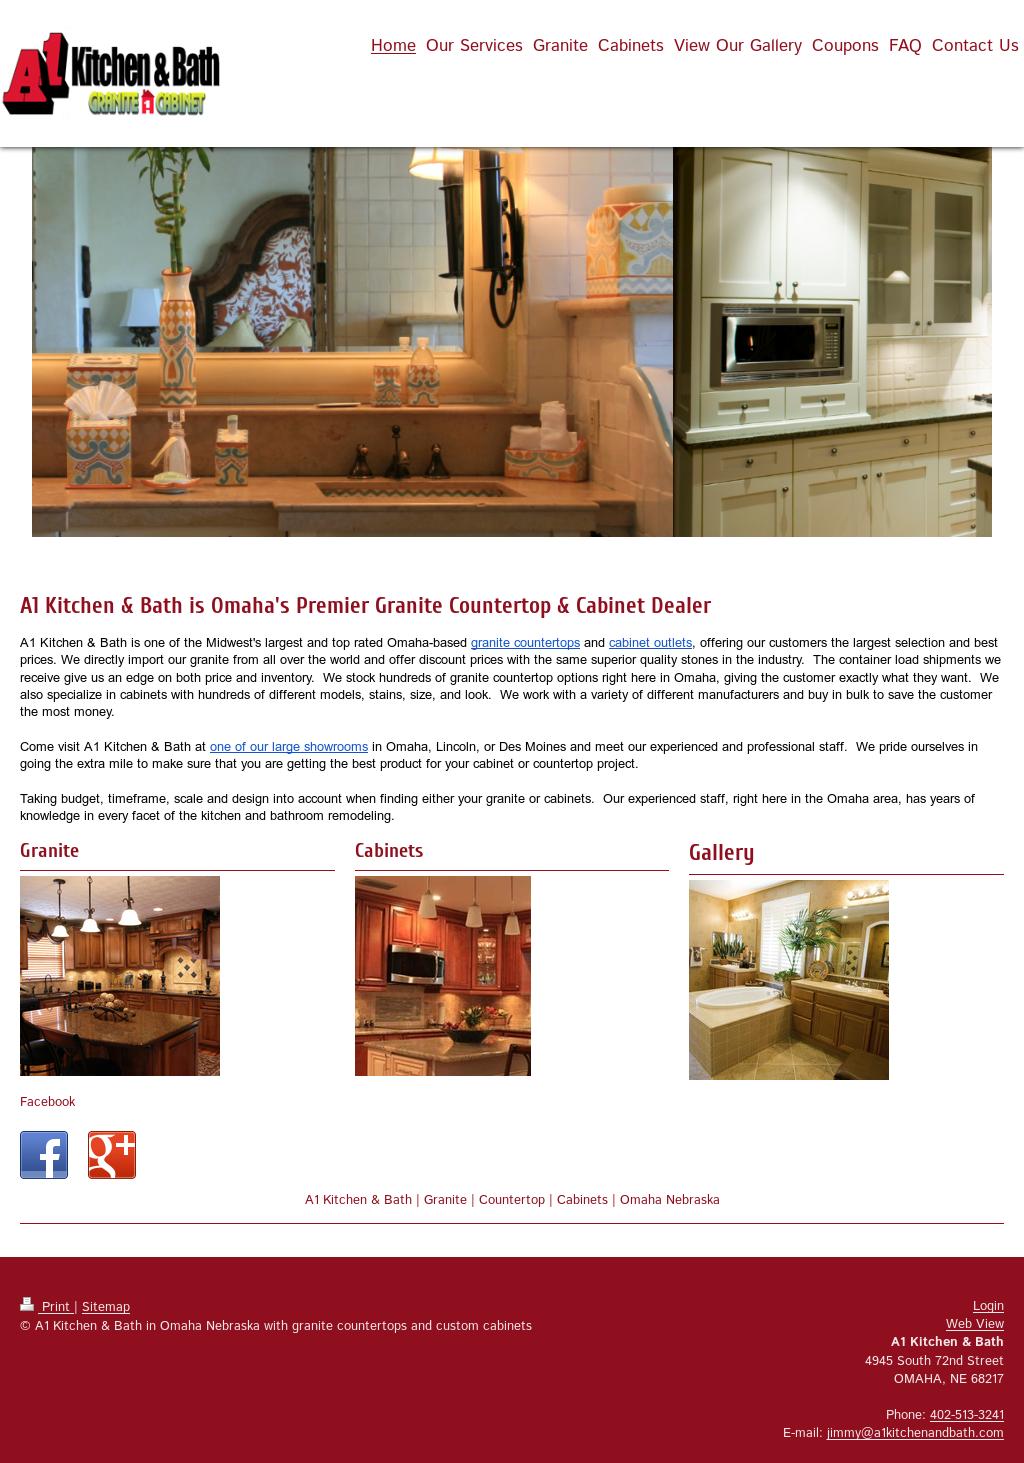 Merveilleux A1 Kitchen U0026 Bath Competitors, Revenue And Employees   Owler Company Profile